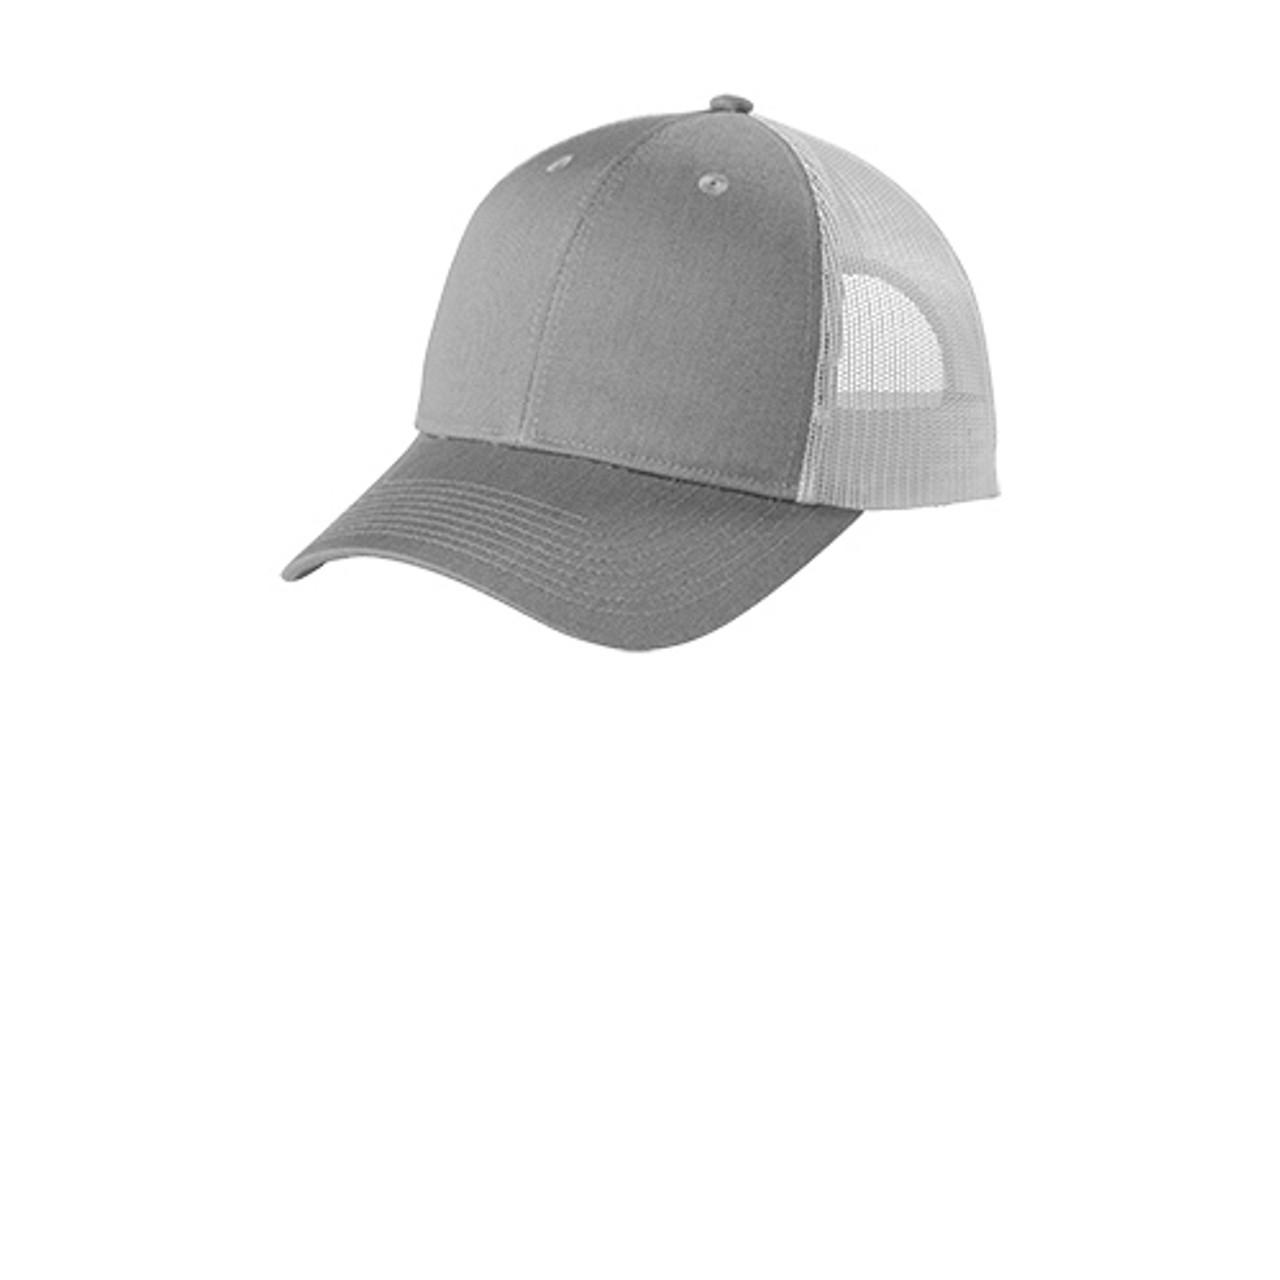 Custom Low Profile Snapback Trucker Caps